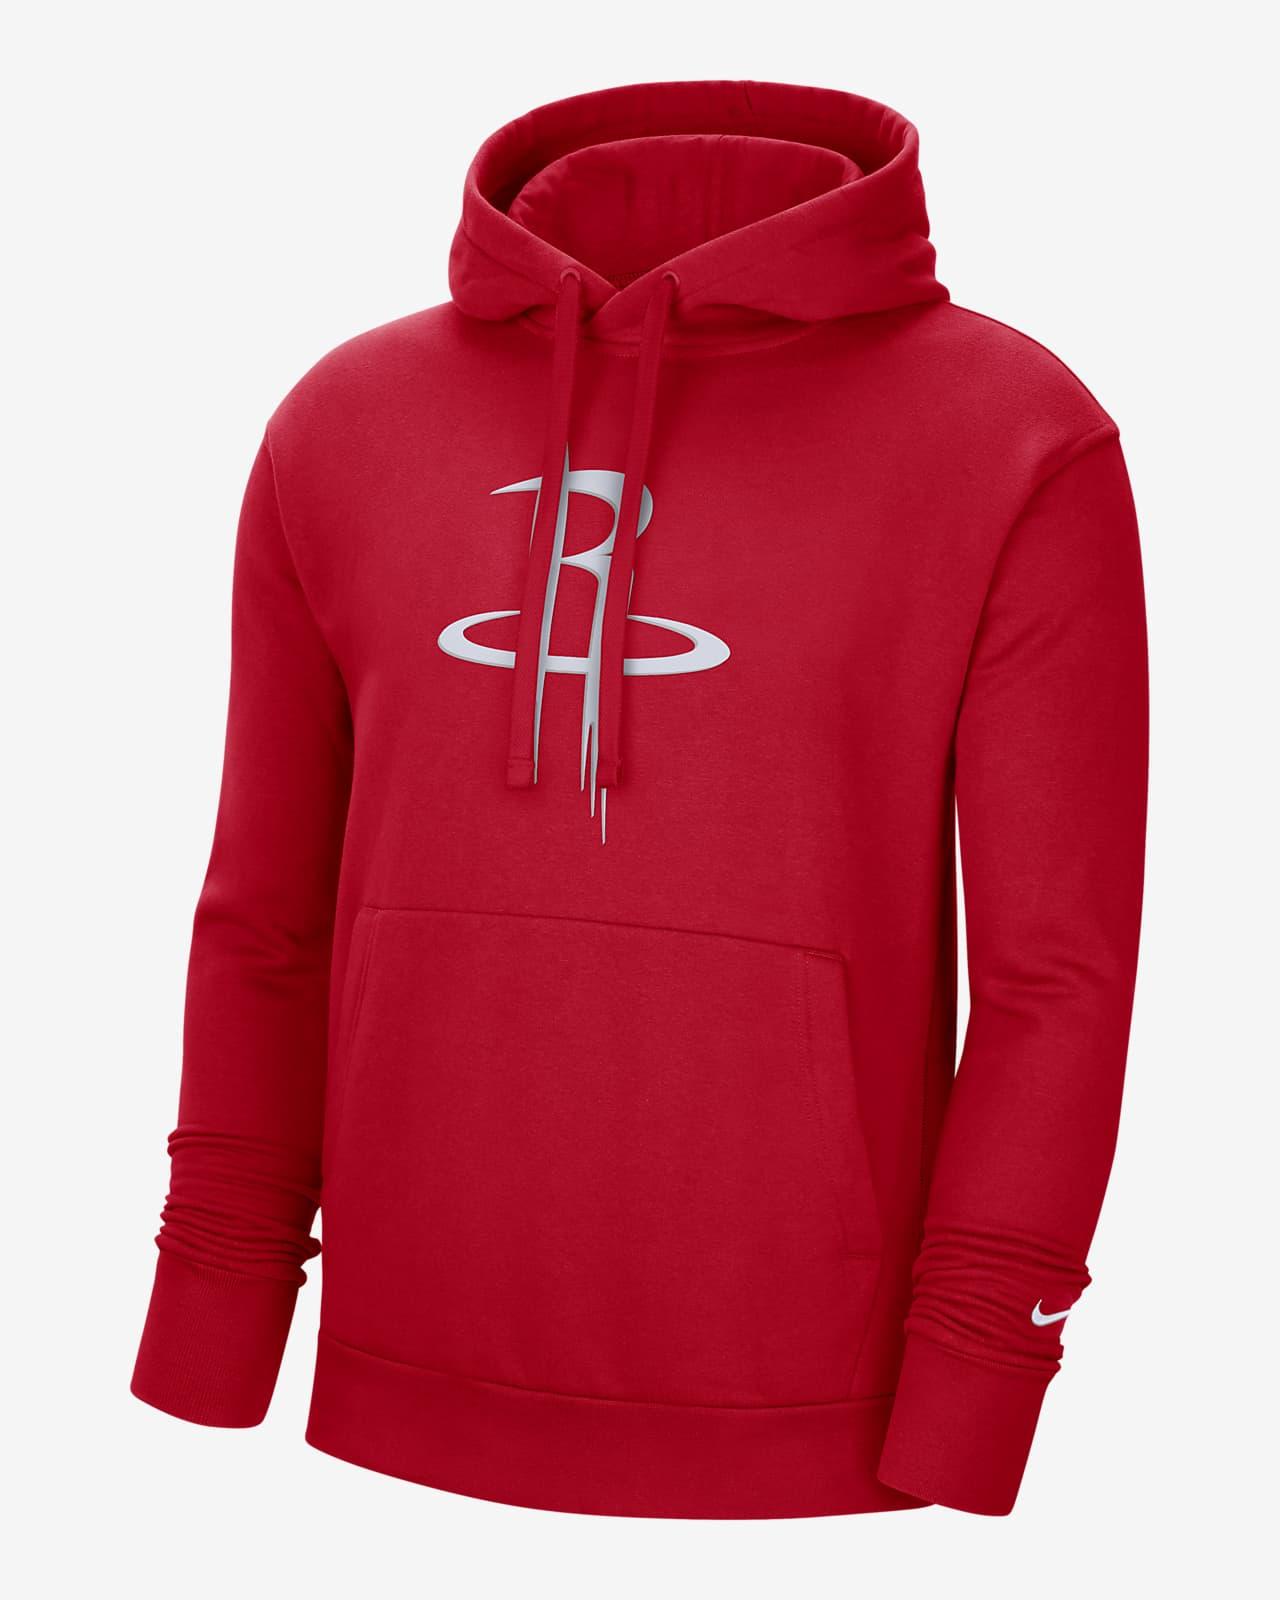 red nike hoodie | Red nike jacket, Red nike hoodie, Red nike